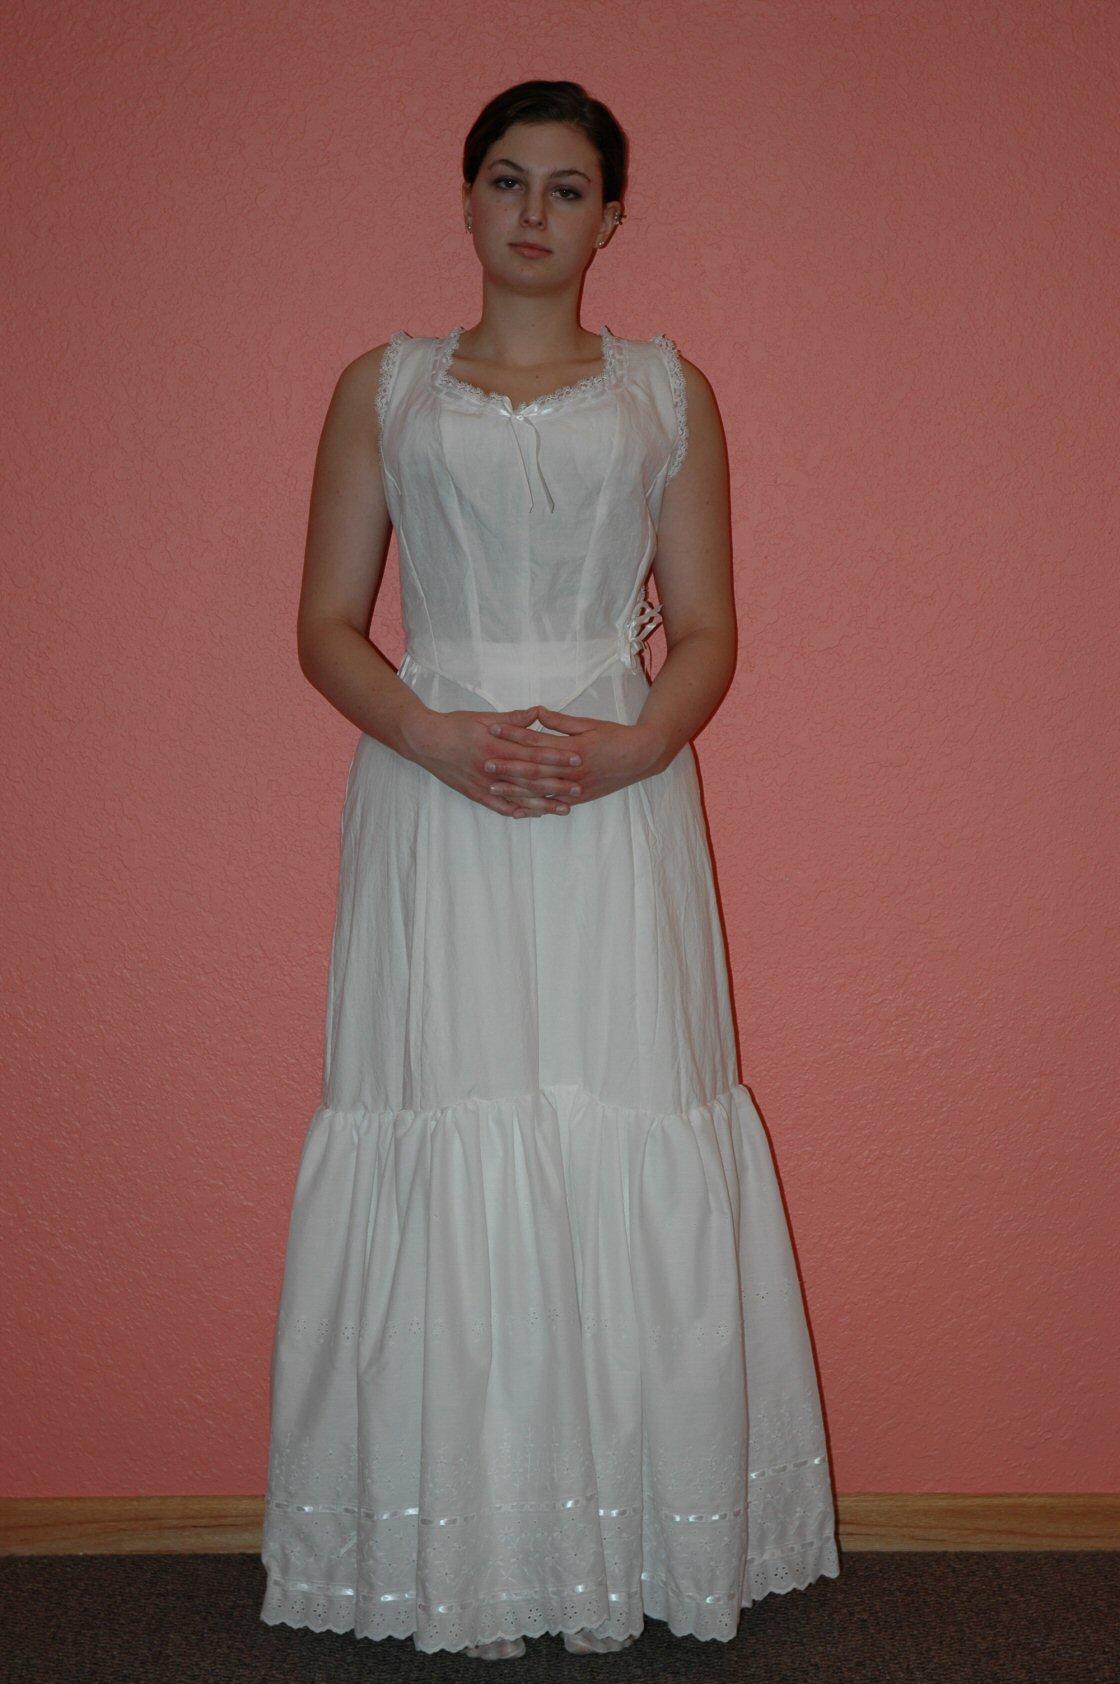 Corset Cover and Petticoat